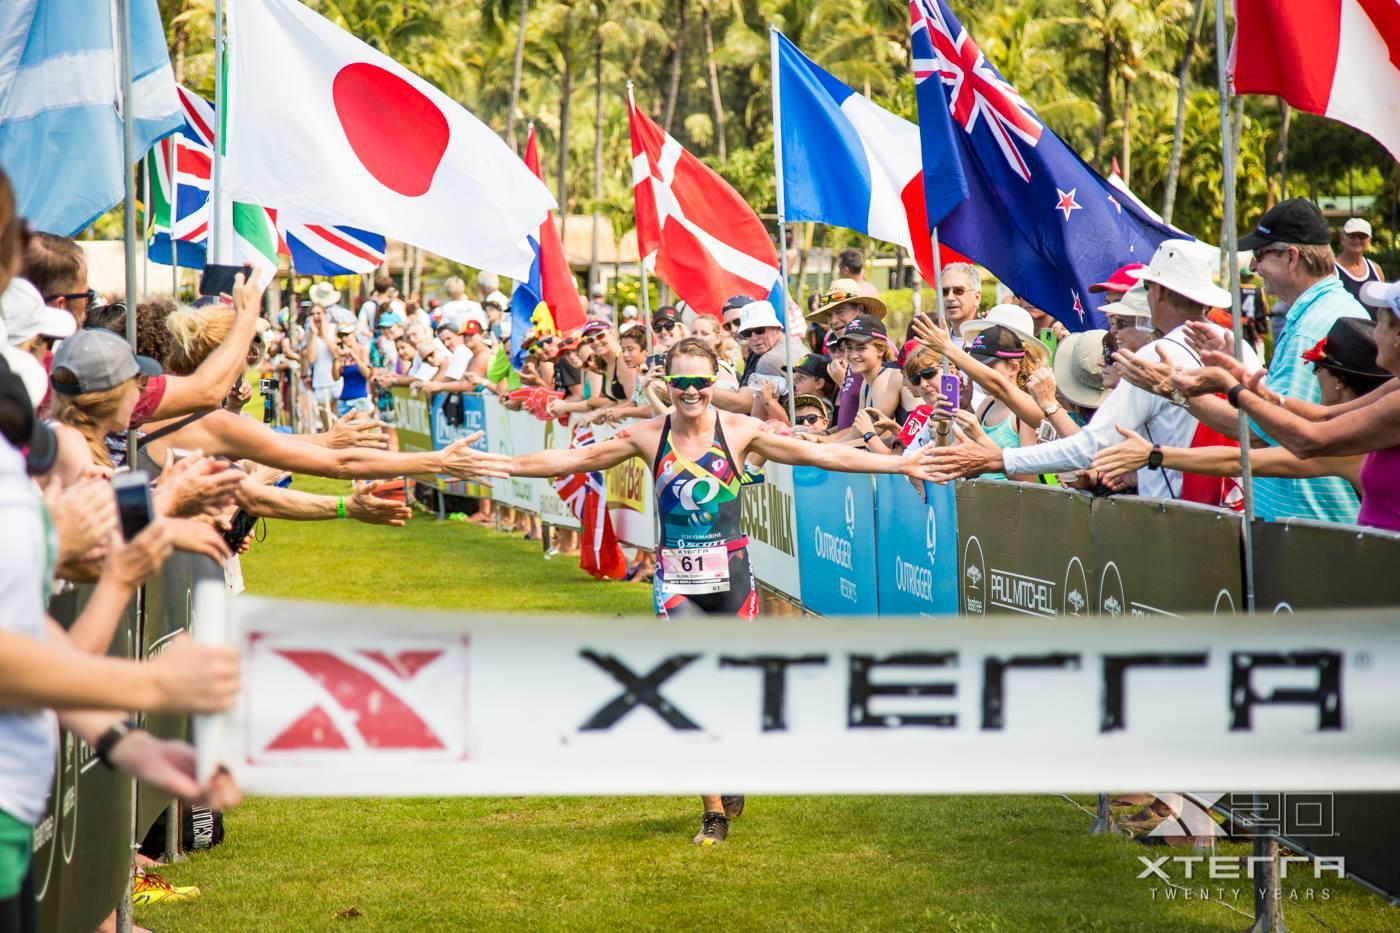 XTERRA_WORLD_CHAMPIONSHIP_2015_00052